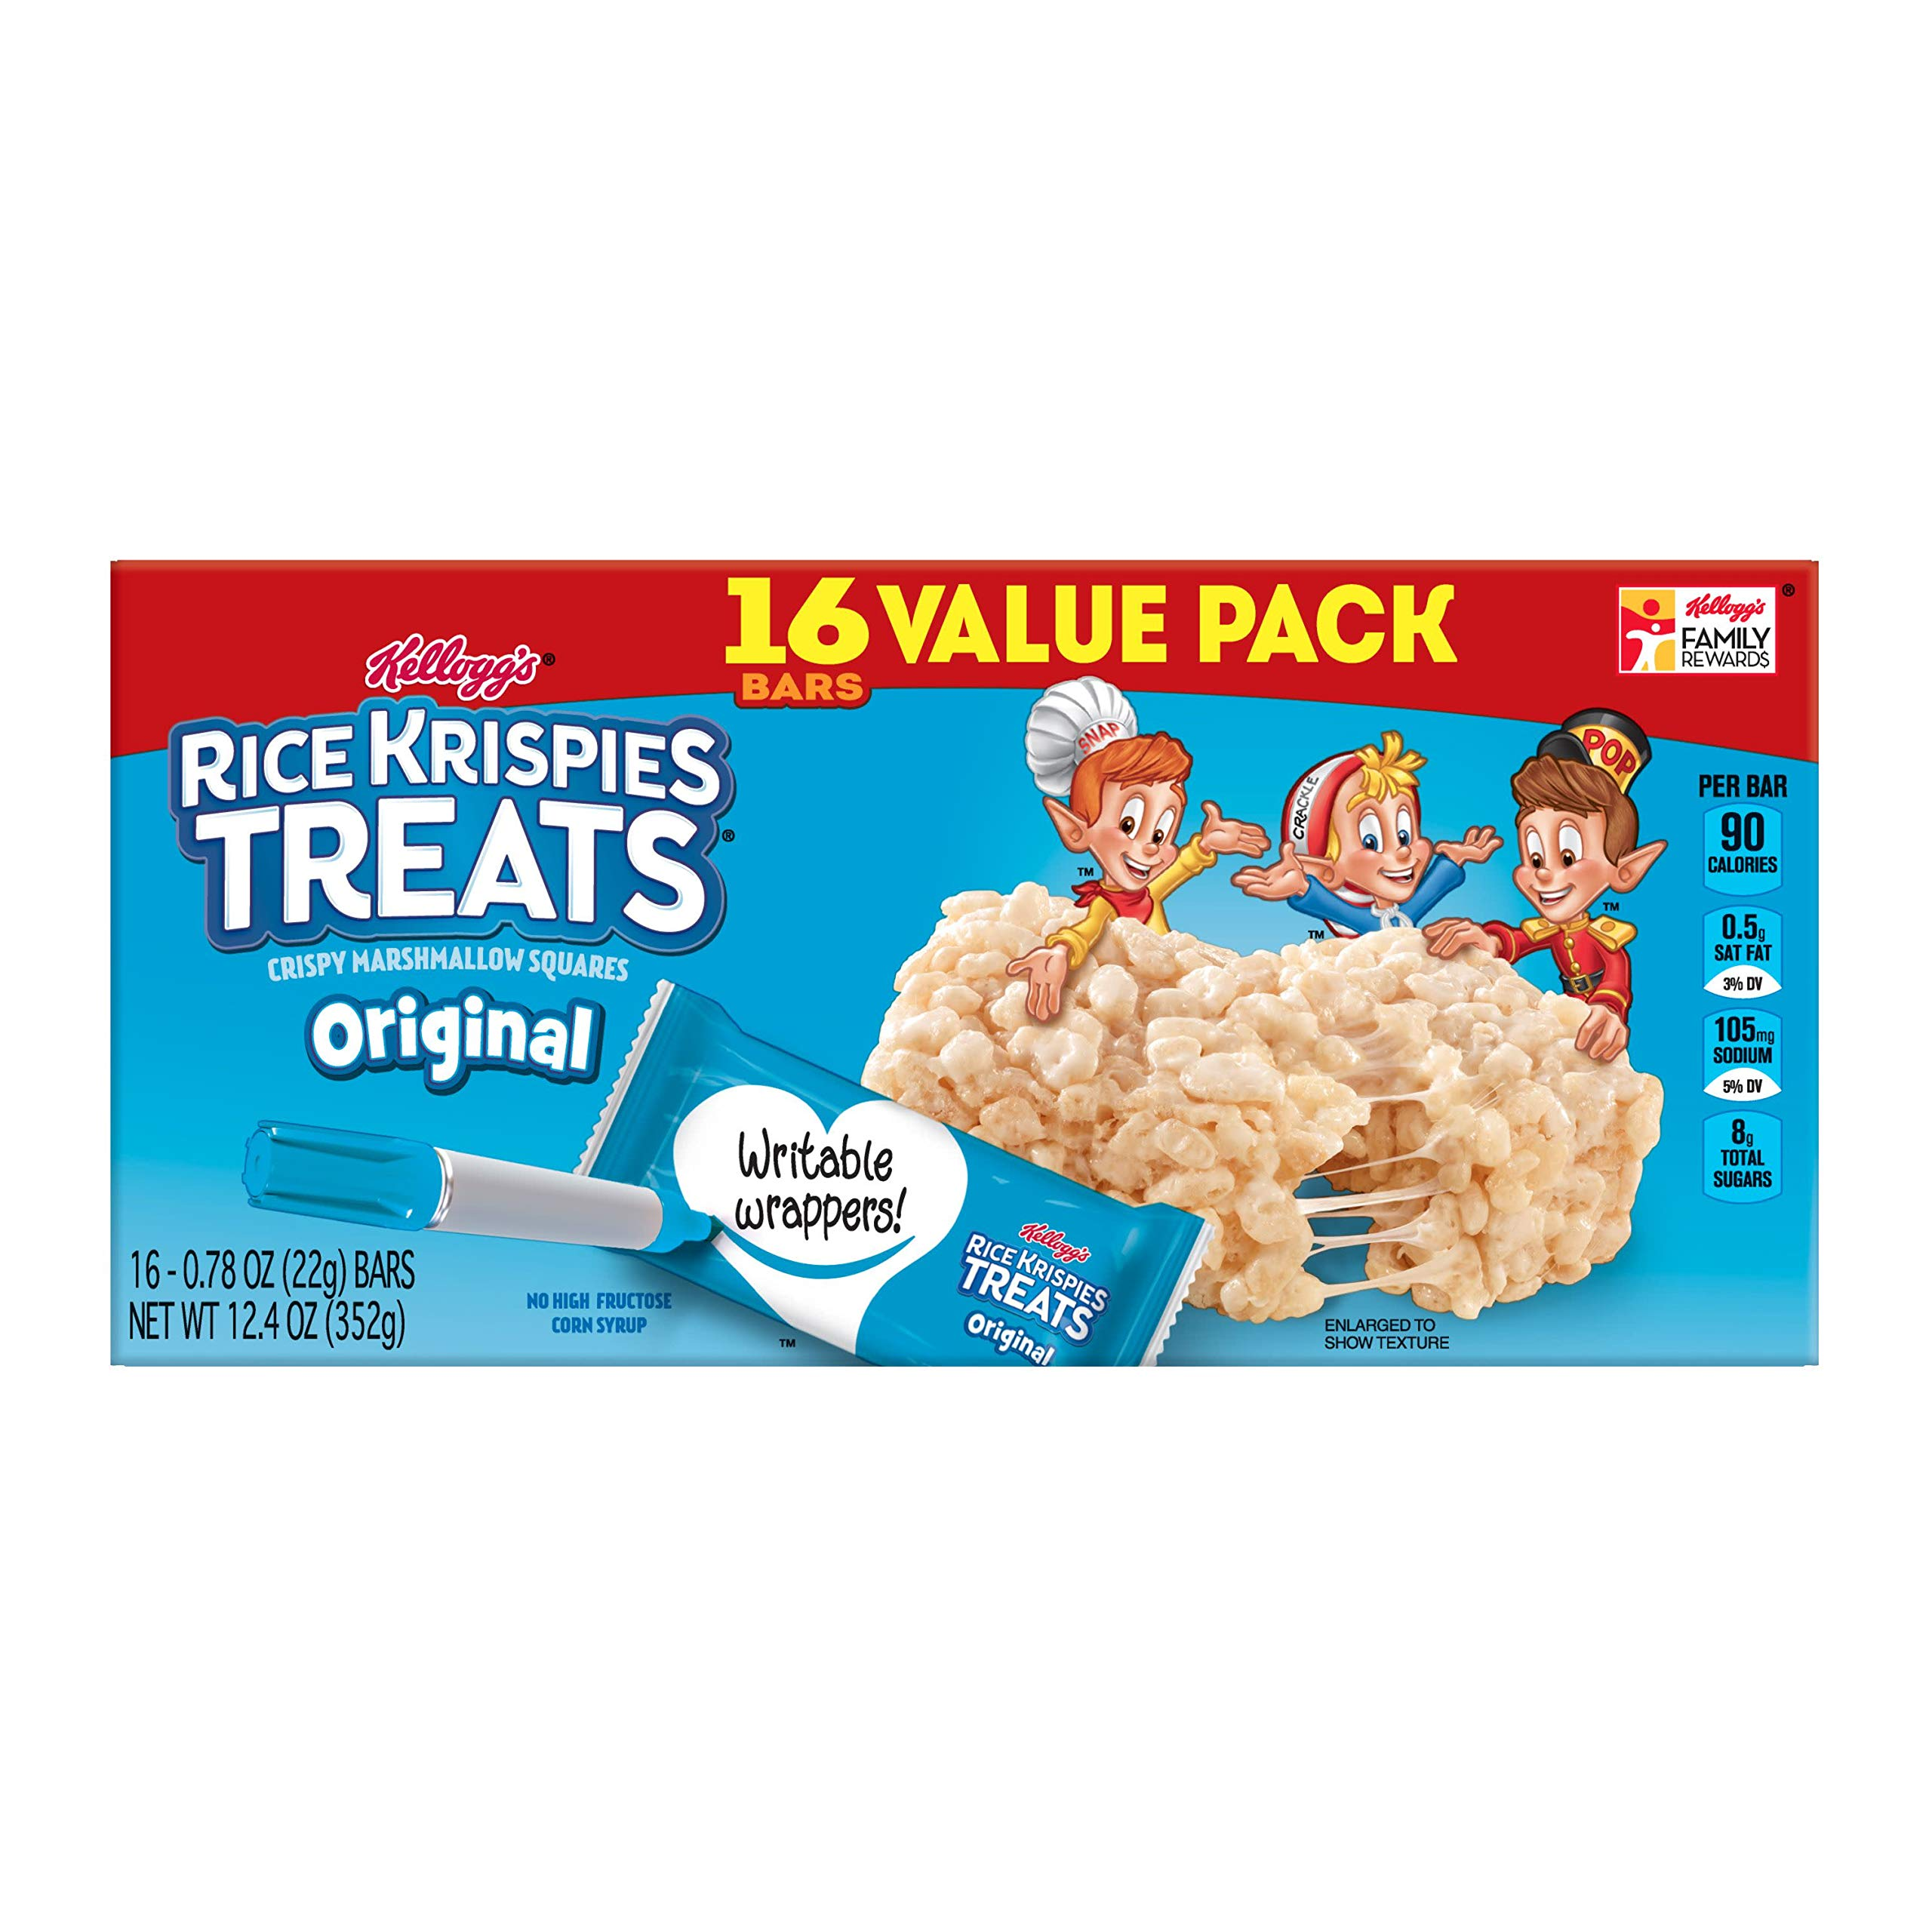 Kellogg's Rice Krispies Treats, Crispy Marshmallow Squares, Original, Value Pack, 0.78 oz Bars(16 Count) by Rice Krispies (Image #11)